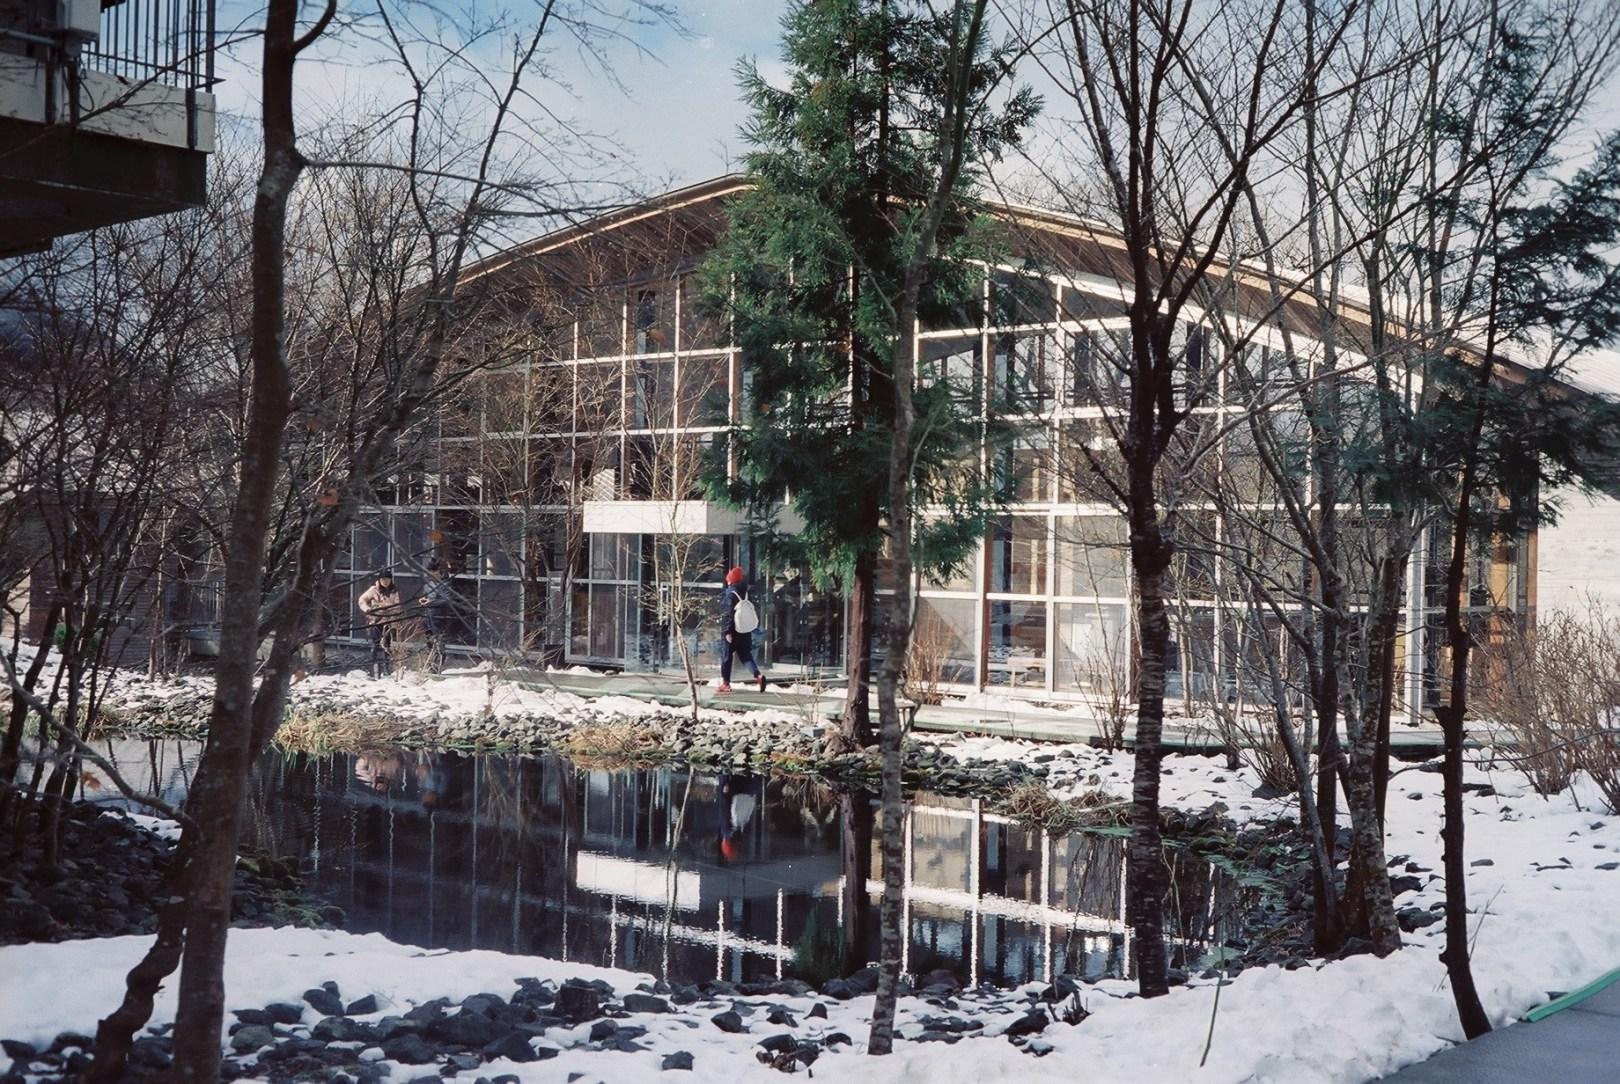 Hakone stay 箱根住宿 – 森林系Hakone Retreat Fore一泊二食